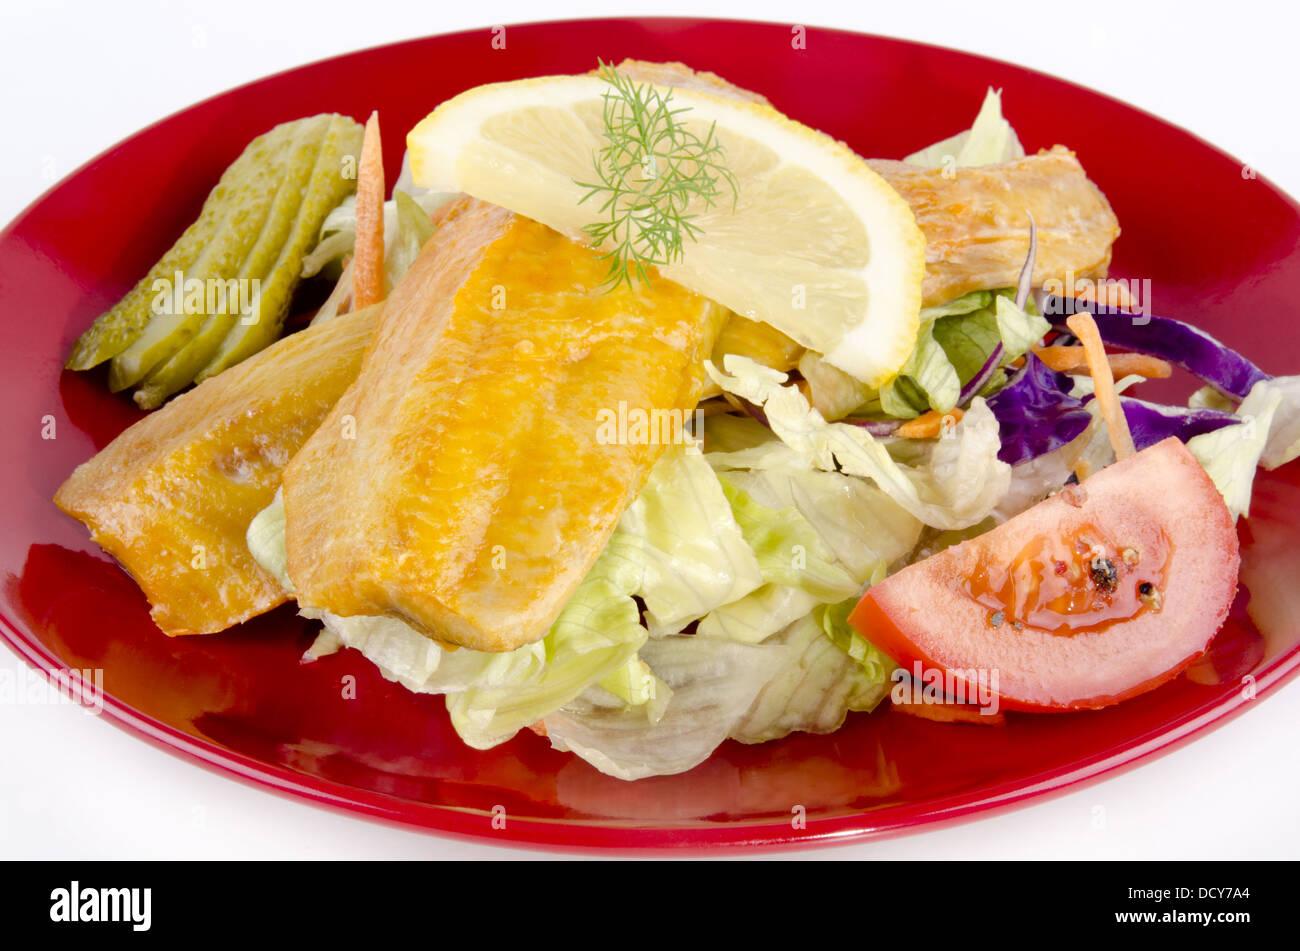 Fresh Scottish kipper with organic salad on a plate - Stock Image